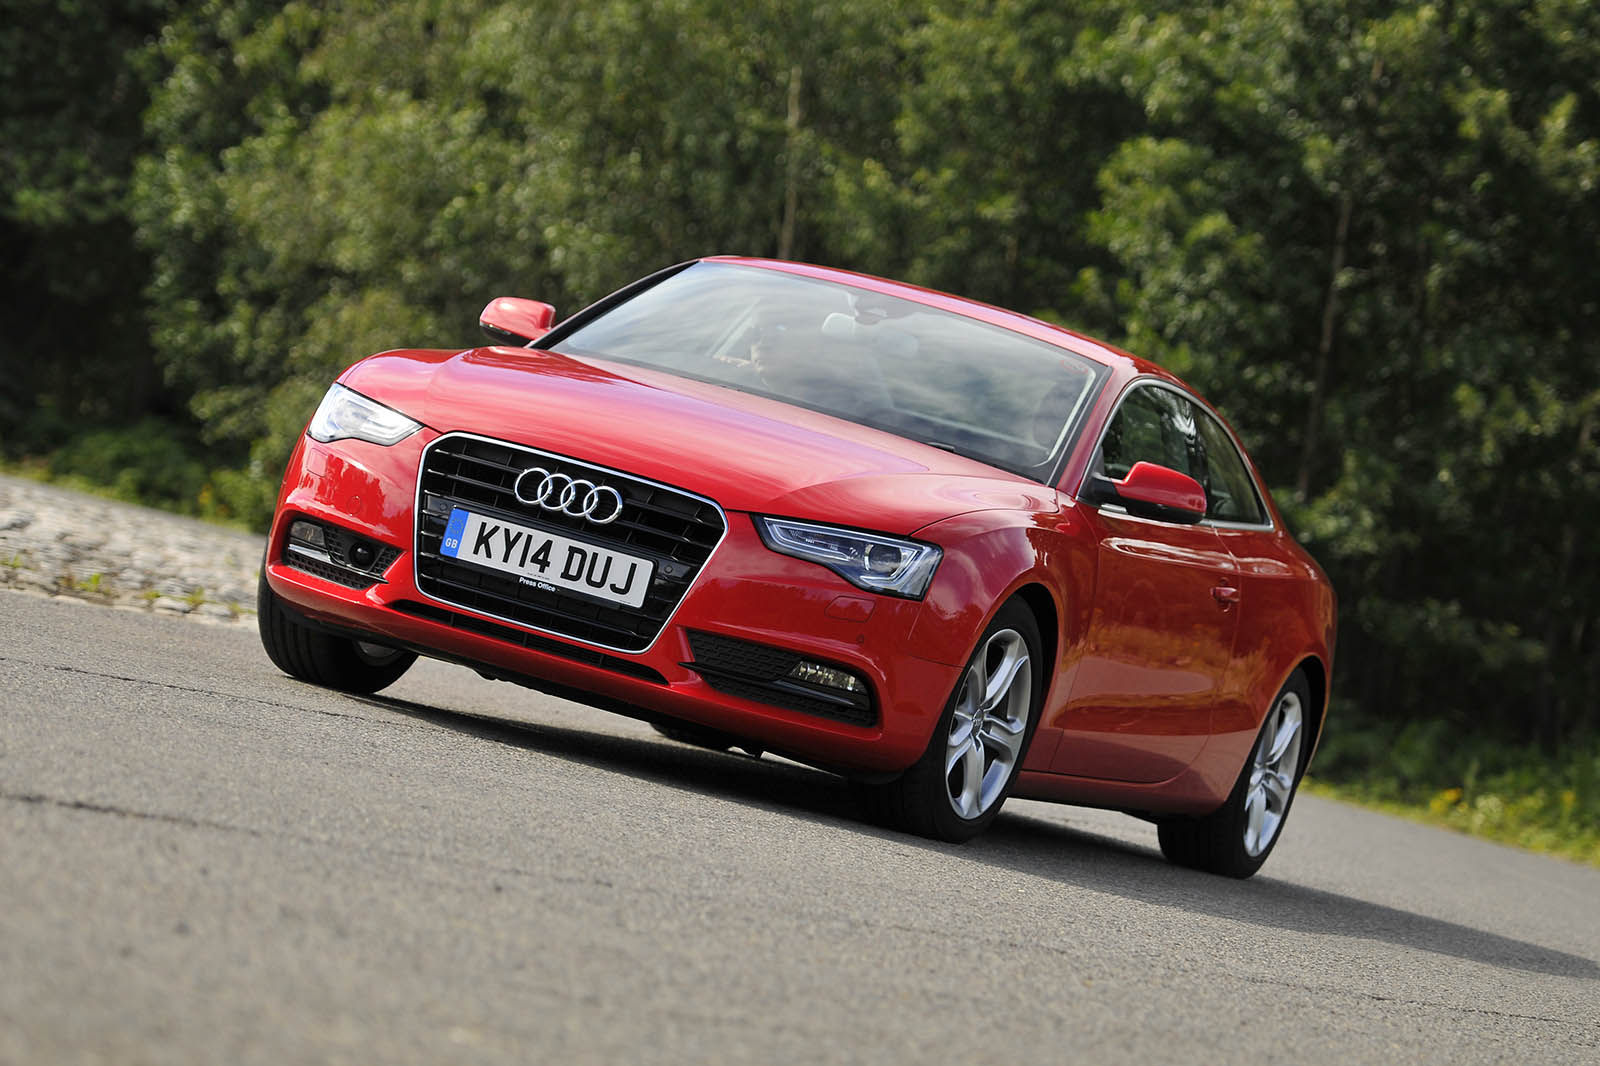 Kelebihan Audi A5 2007 Murah Berkualitas